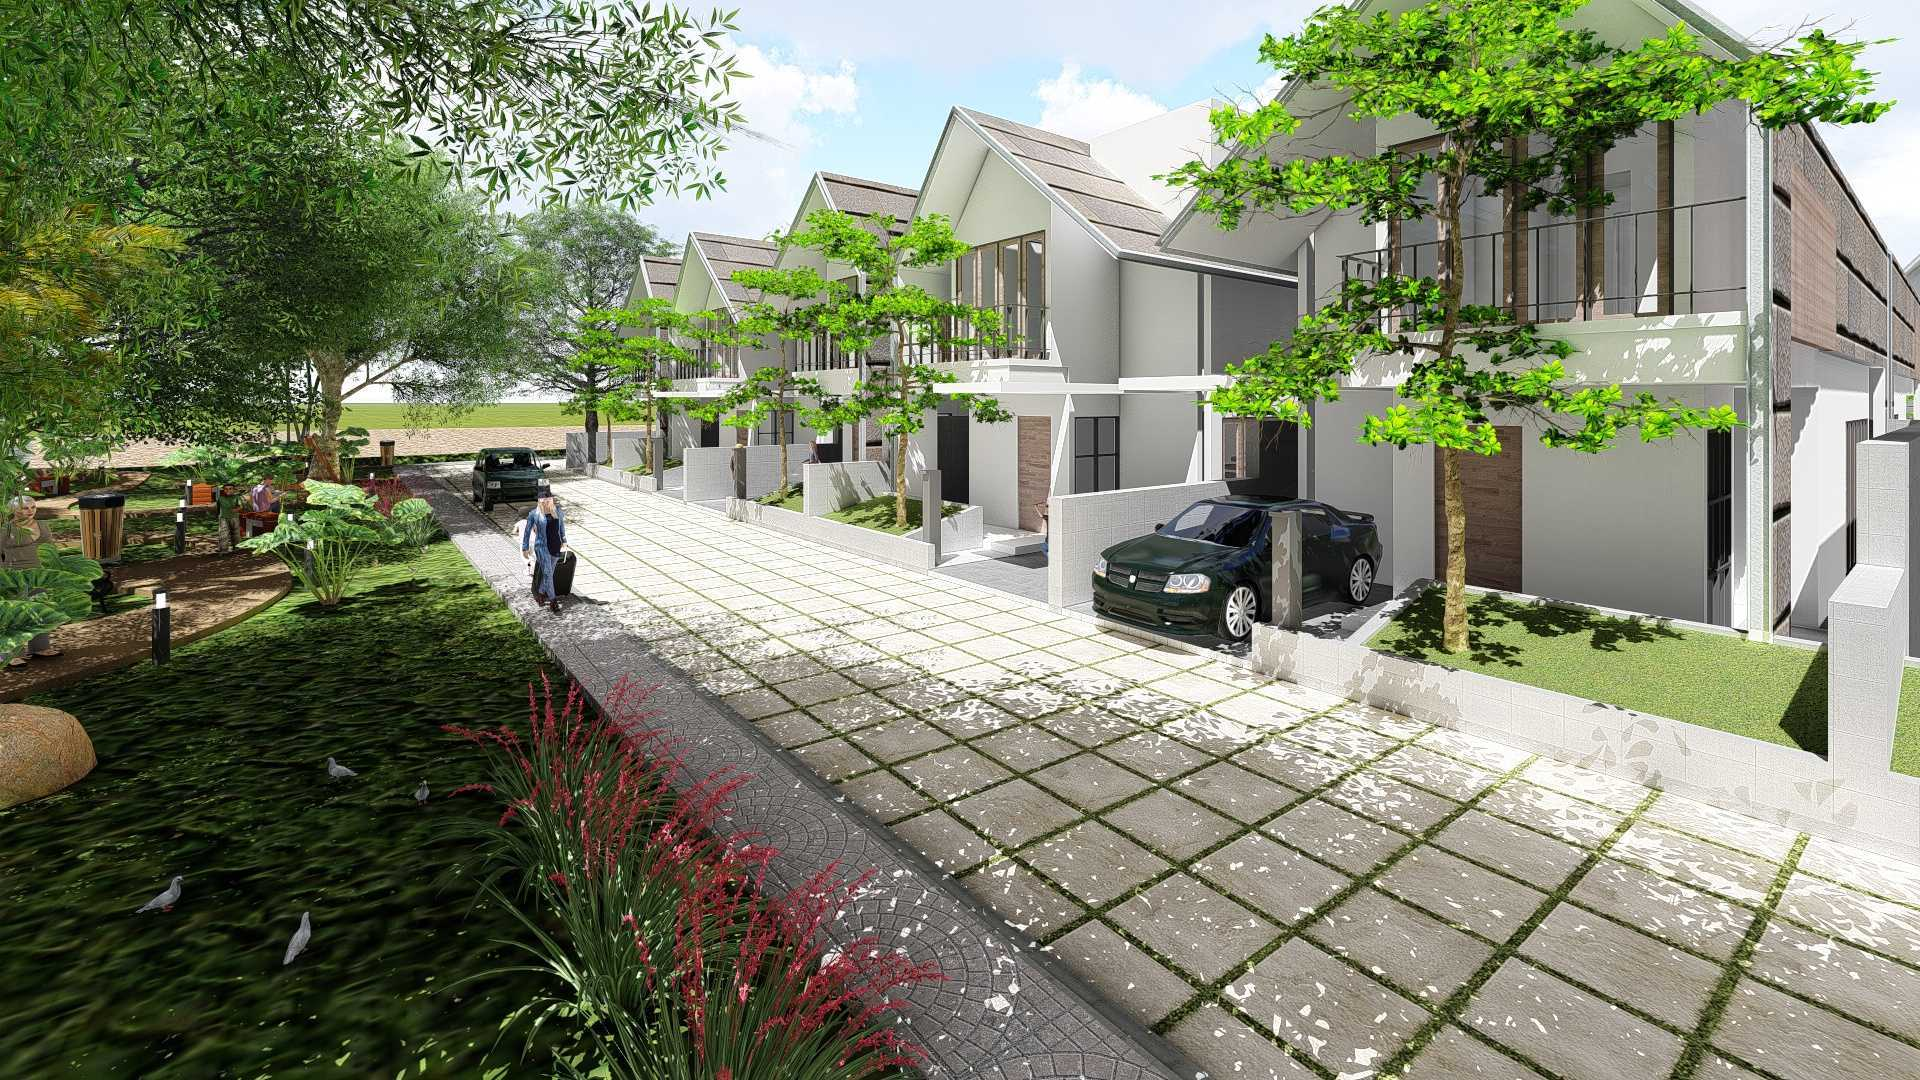 Samitrayasa Design Limo Housing Limo, Kota Depok, Jawa Barat, Indonesia Limo, Kota Depok, Jawa Barat, Indonesia 754 Tropis  32832